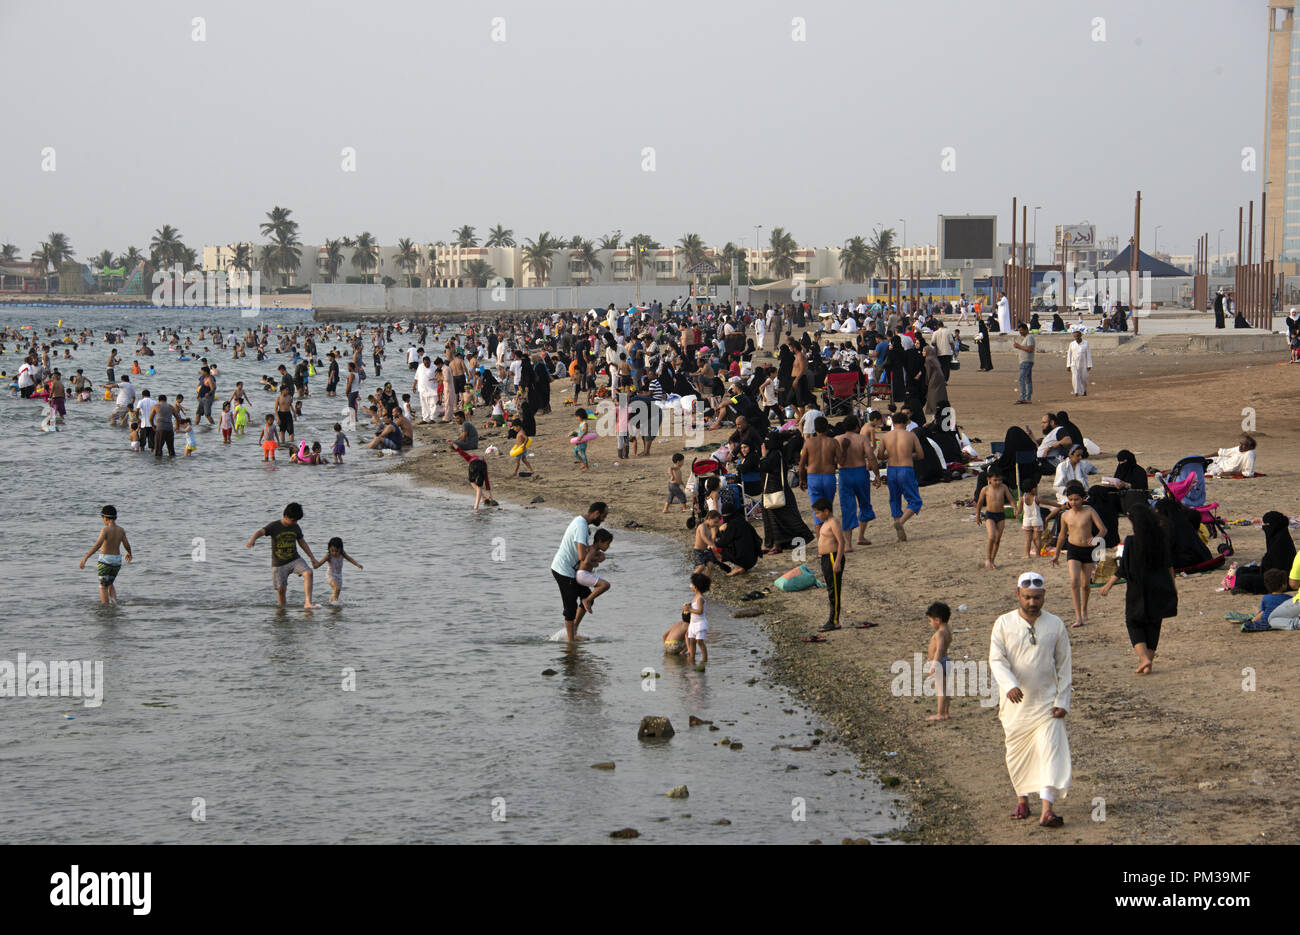 Saudi families gathered by a public Red Sea beach in Jeddah, Saudi Arabia - Stock Image